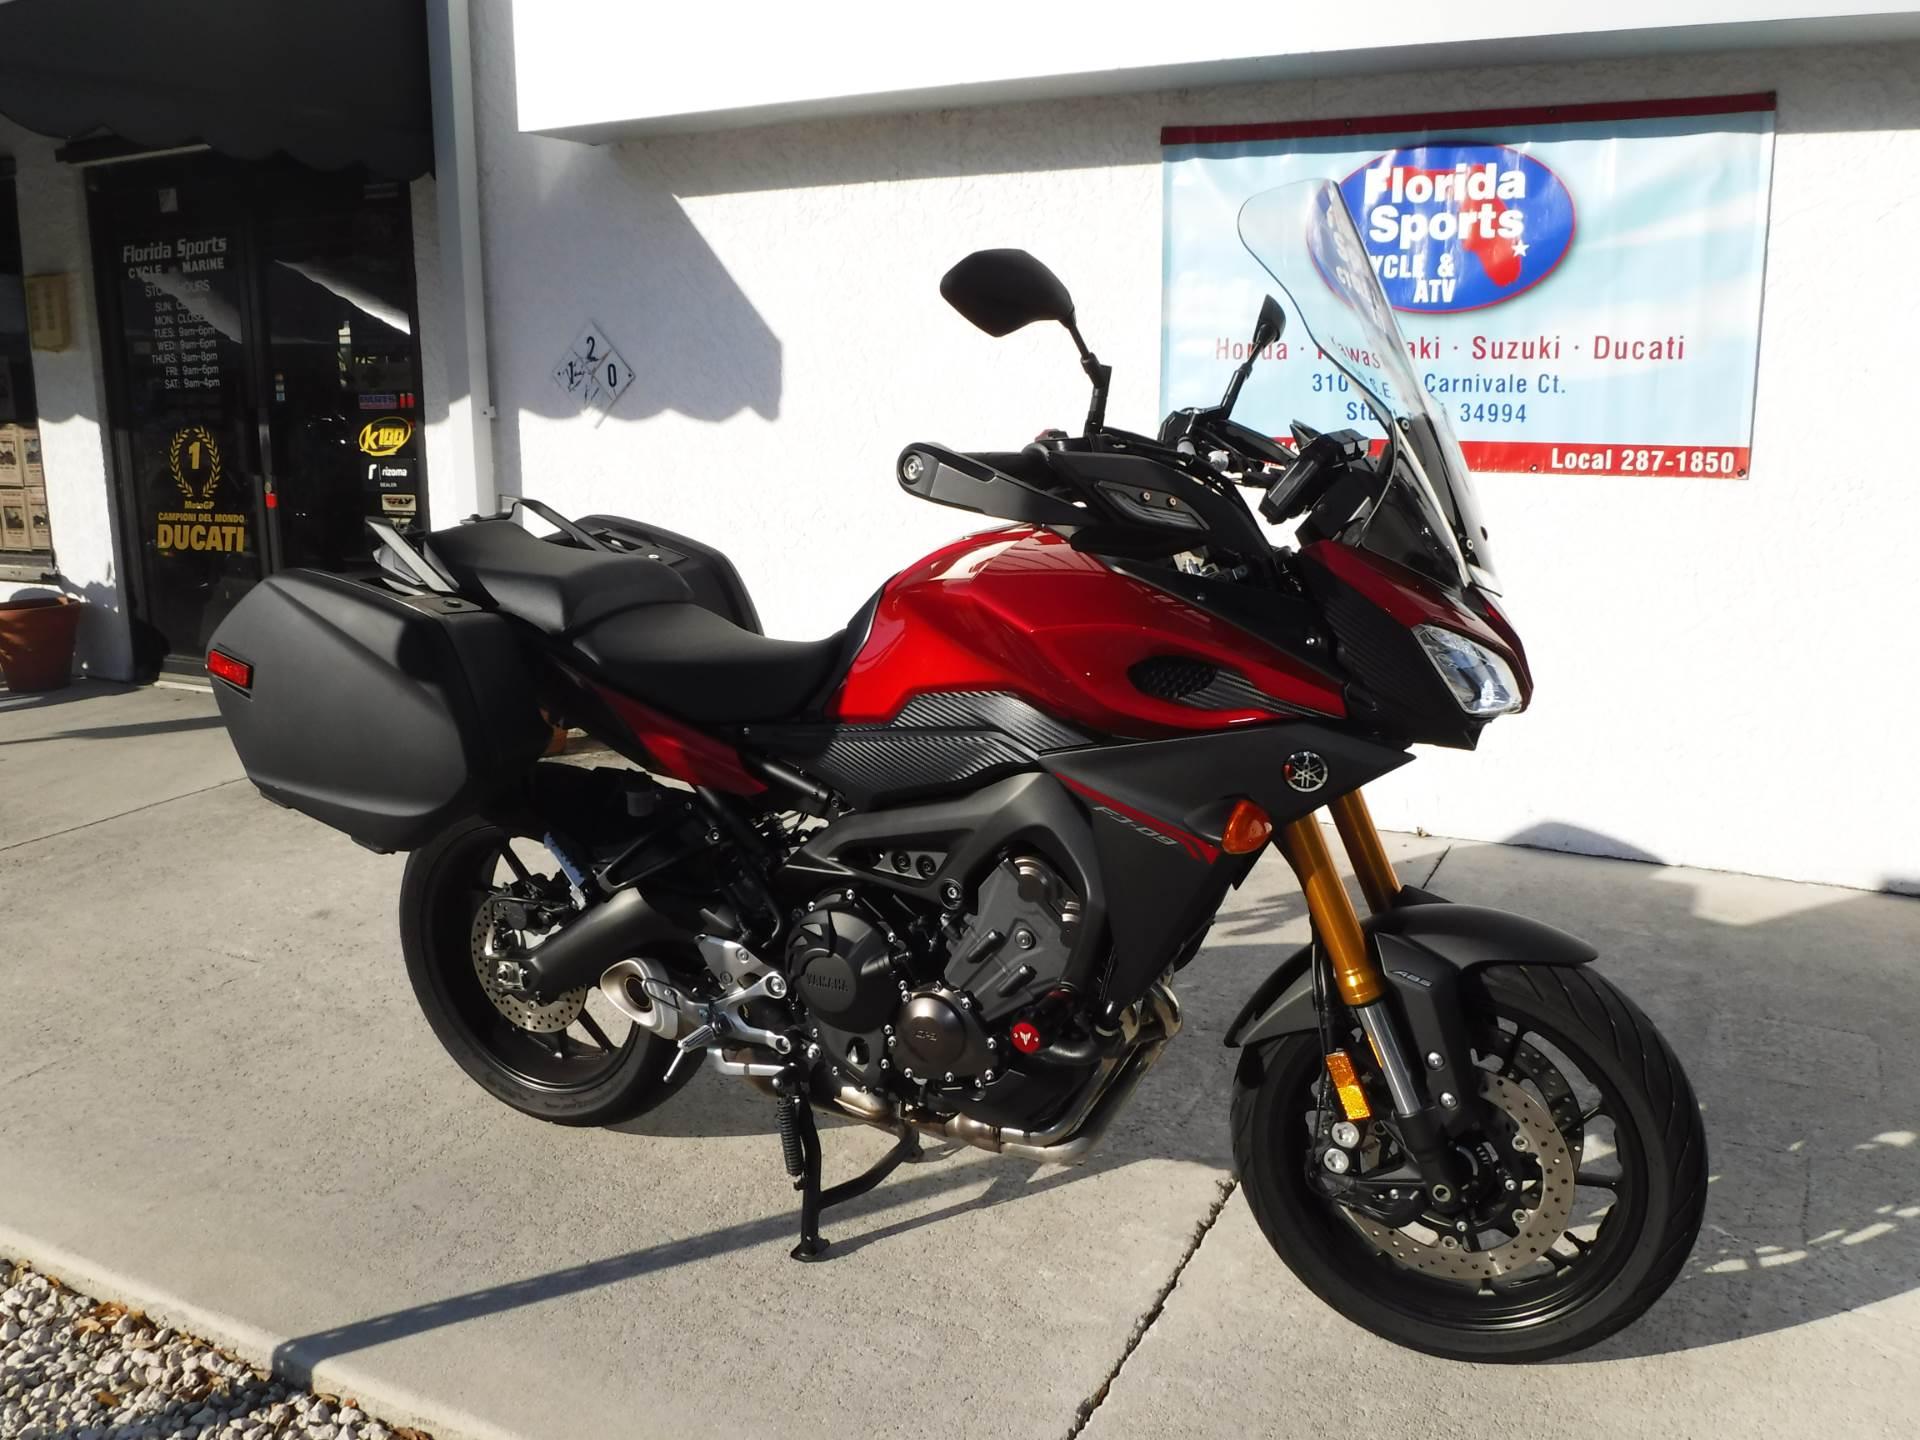 2015 yamaha fj 09 motorcycles stuart florida